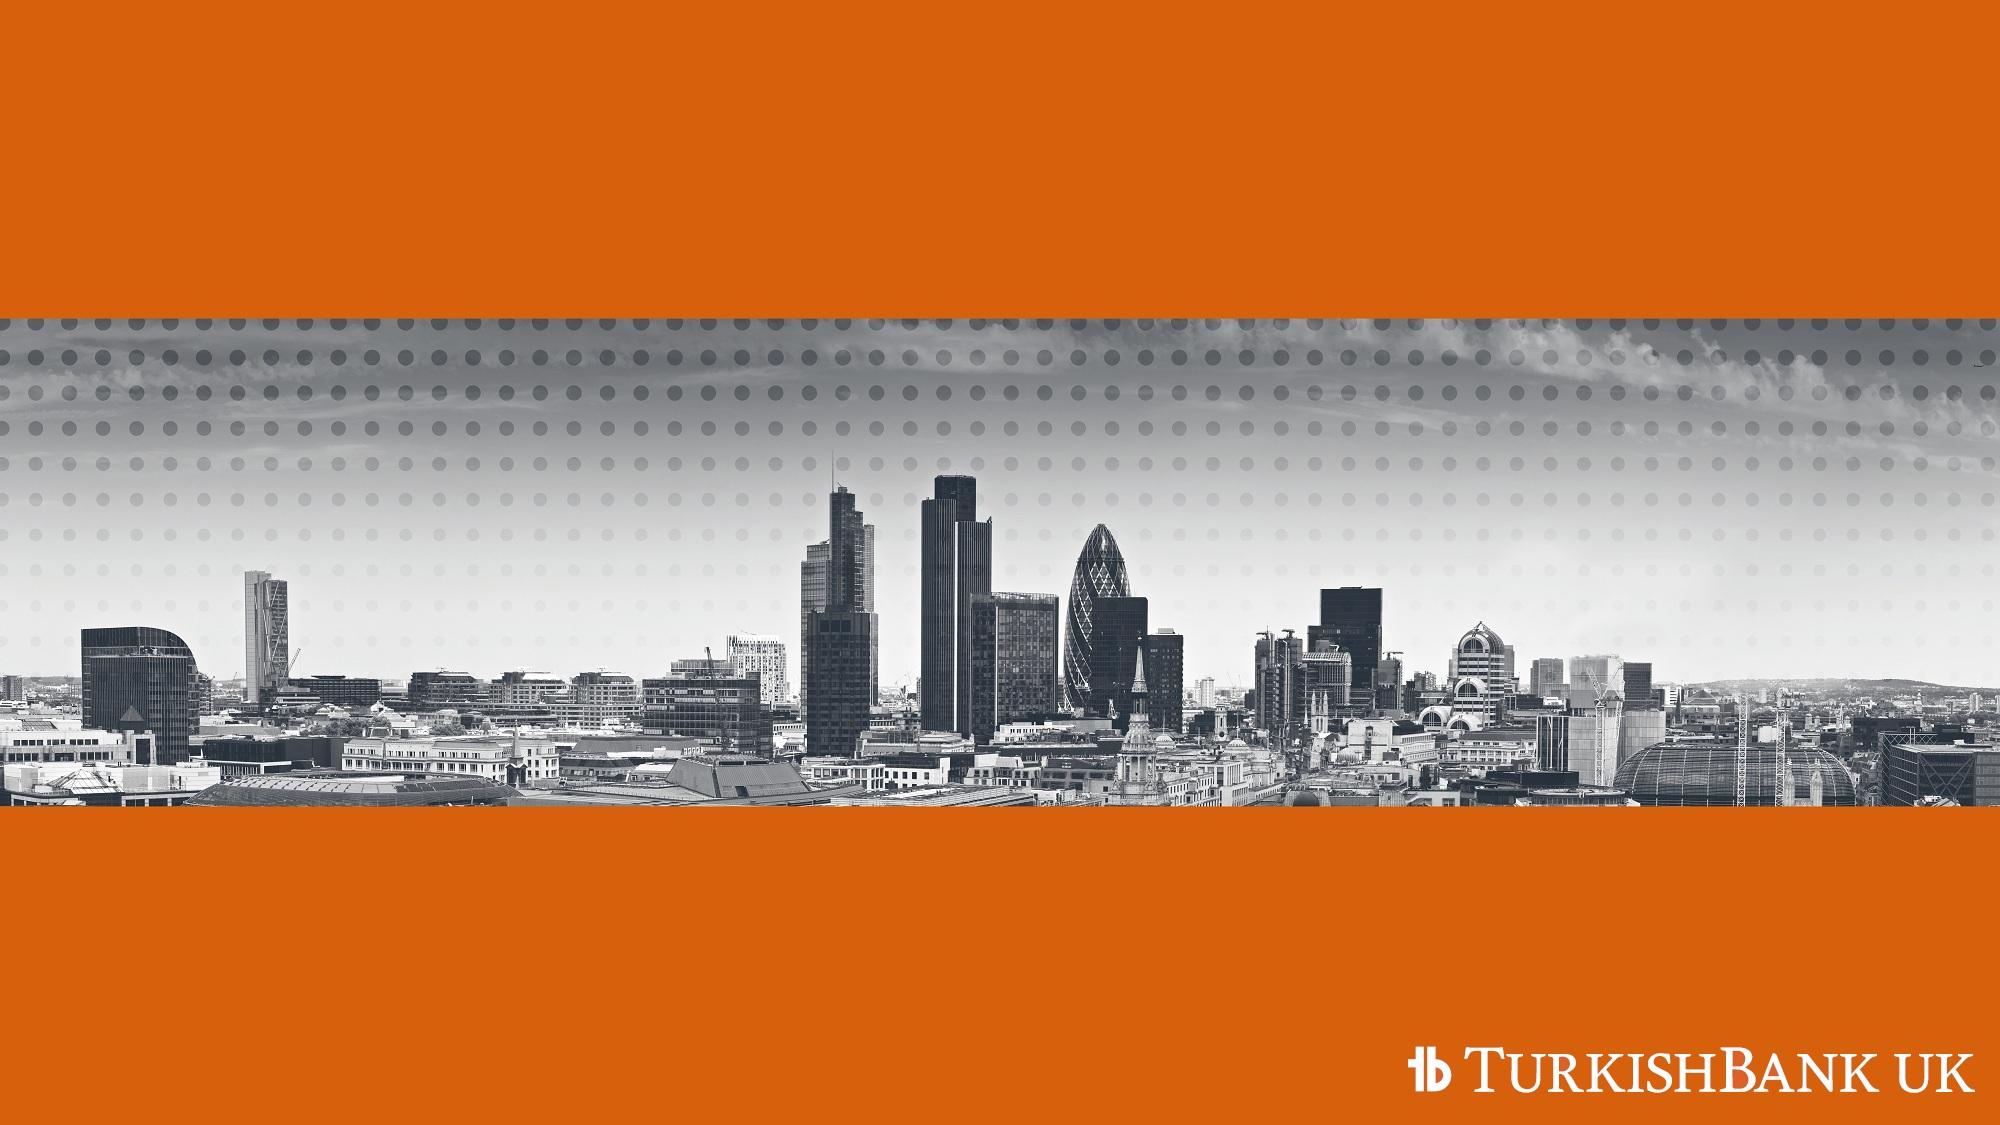 Open banking platform provider Token readies TurkishBank UK for PSD2 compliance